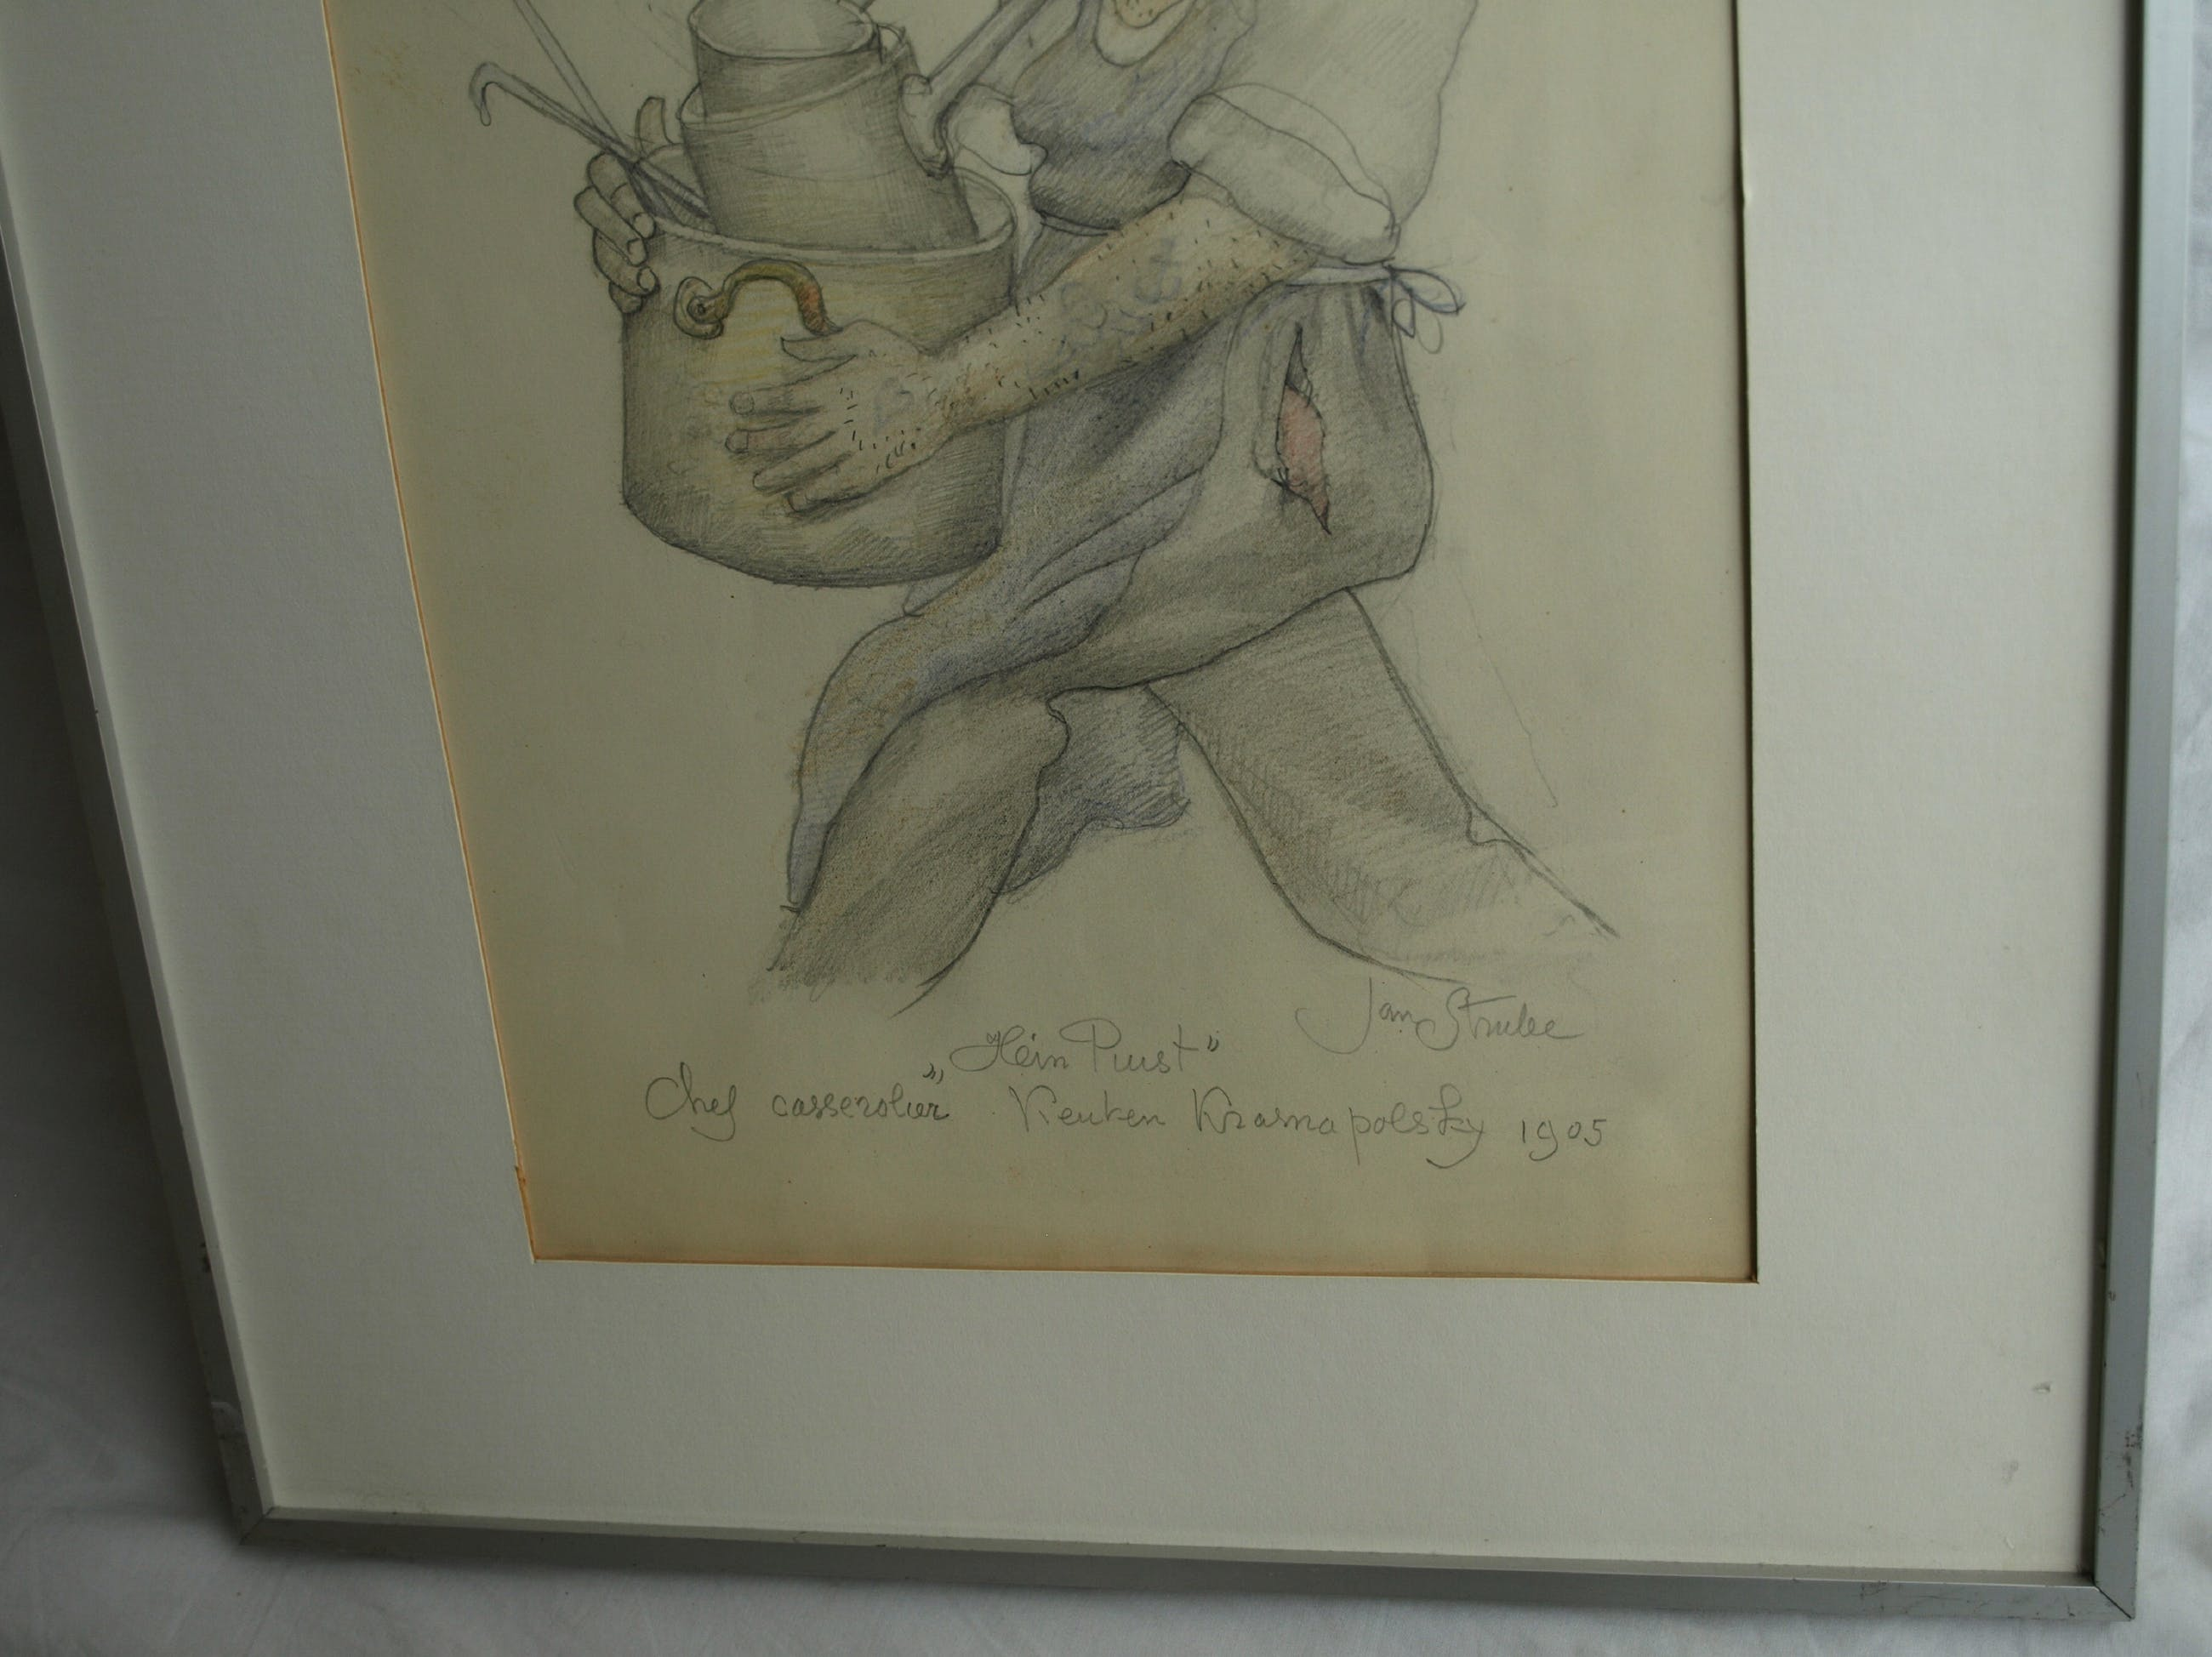 "Jan Strube - Tekening uit 1905 , Casserolier Hotel Krasnapolsky ""Hein Puist"" kopen? Bied vanaf 600!"